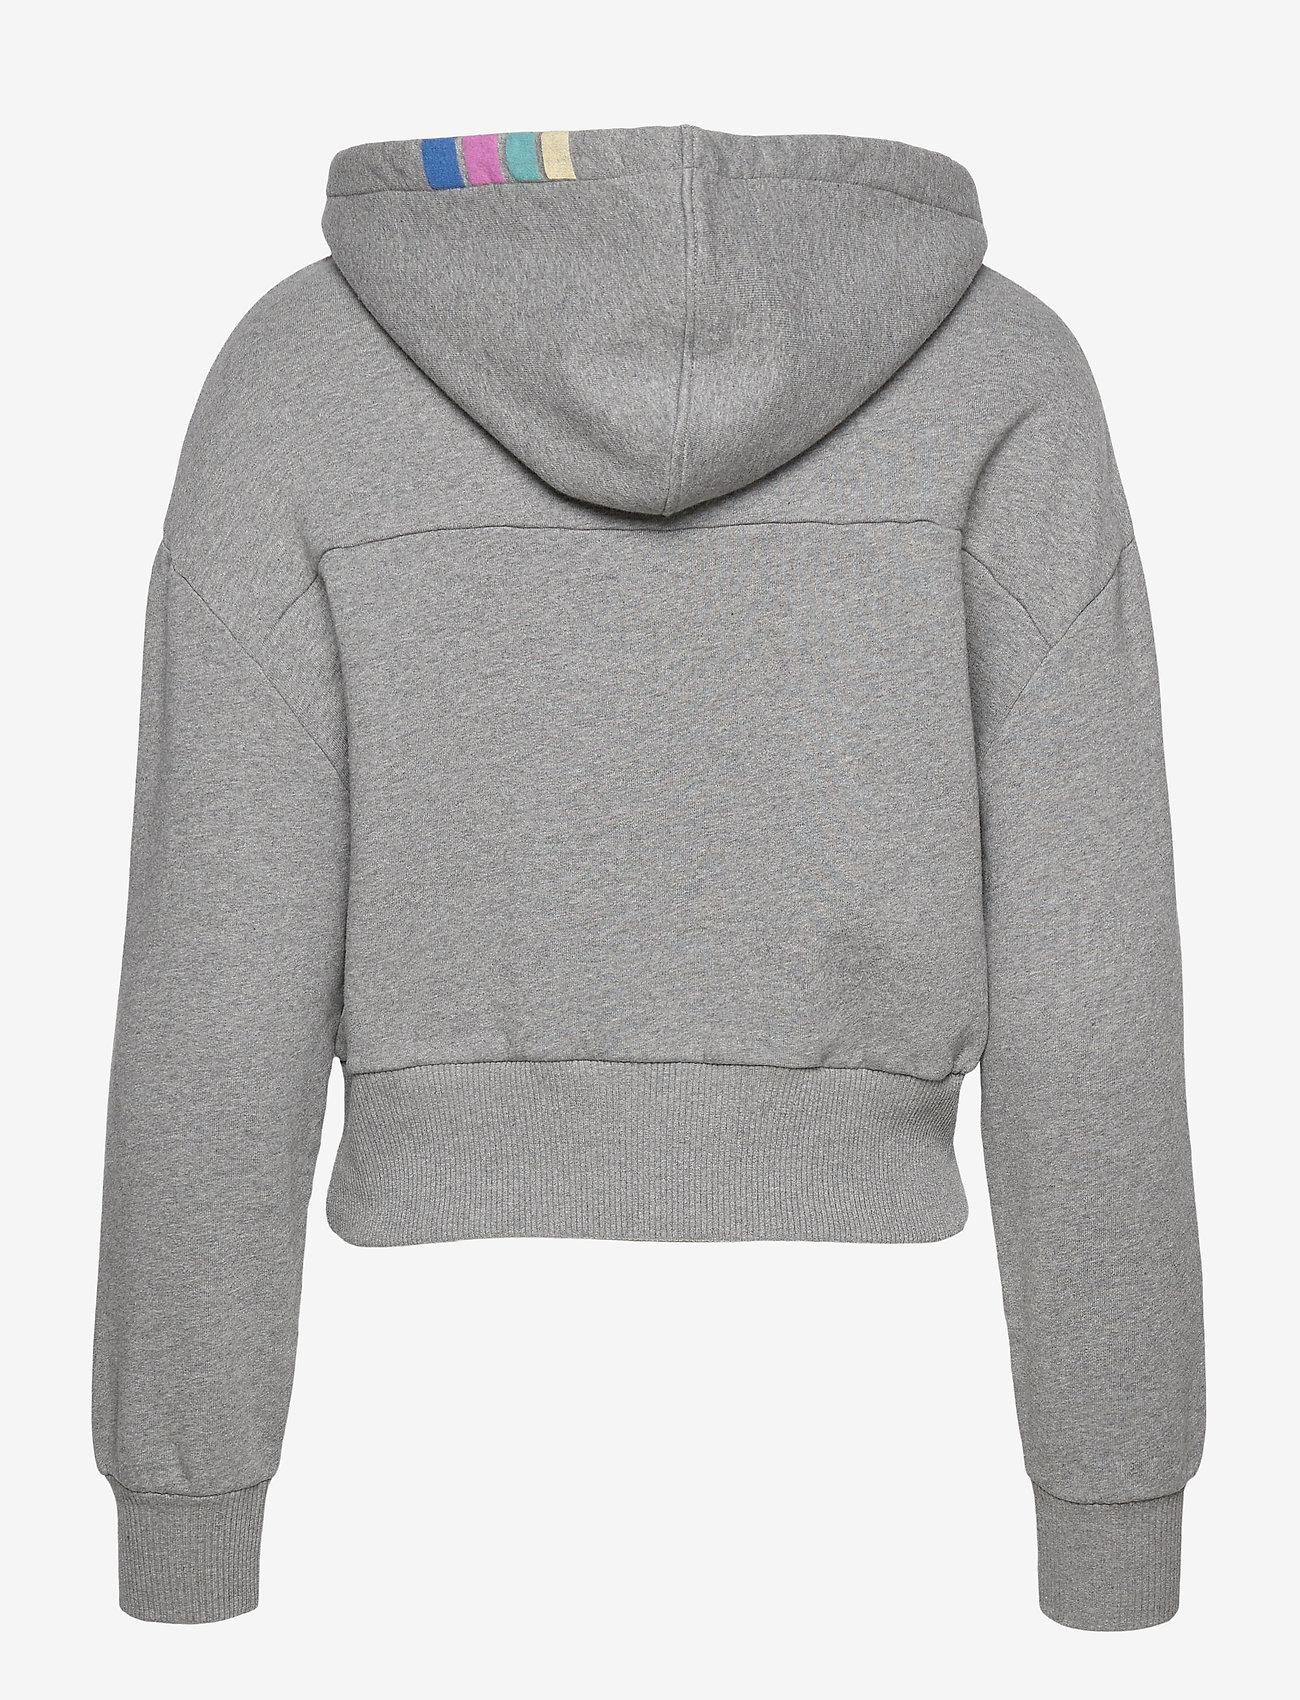 ba&sh - YOUNG SWEAT - sweatshirts & hættetrøjer - gris - 1